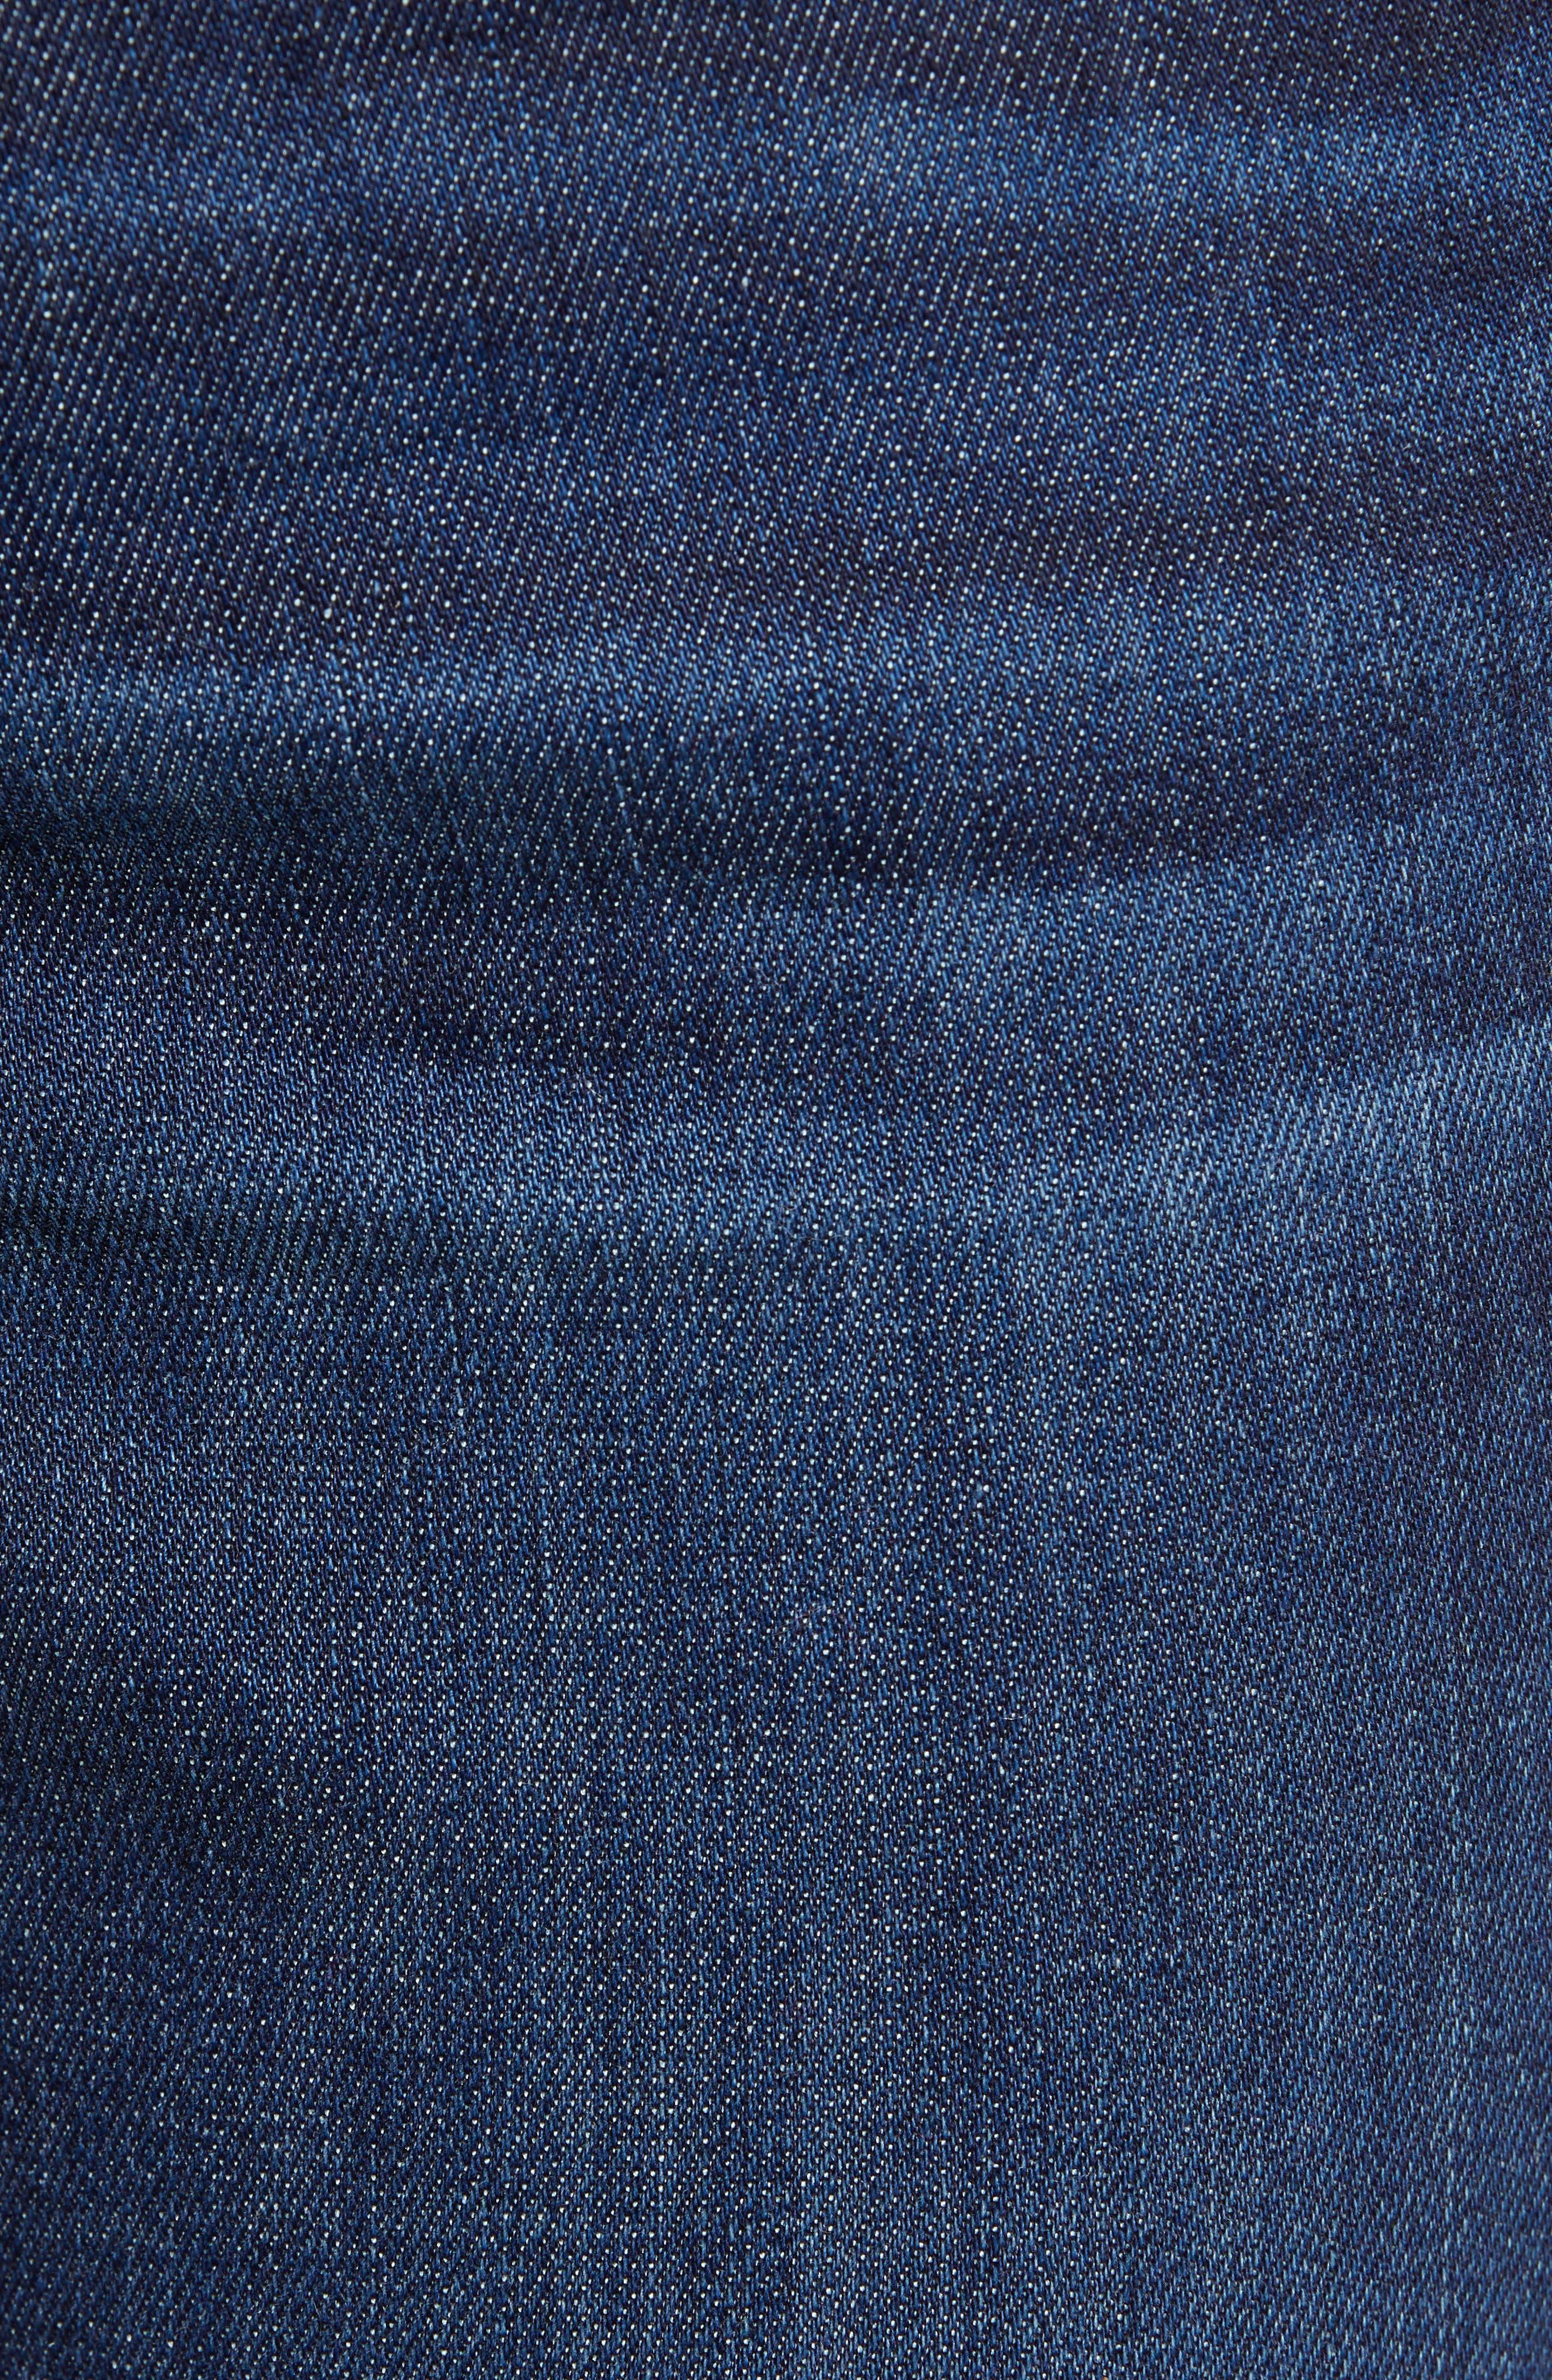 Sierra High Waist Ankle Skinny Jeans,                             Alternate thumbnail 6, color,                             FRANCIS